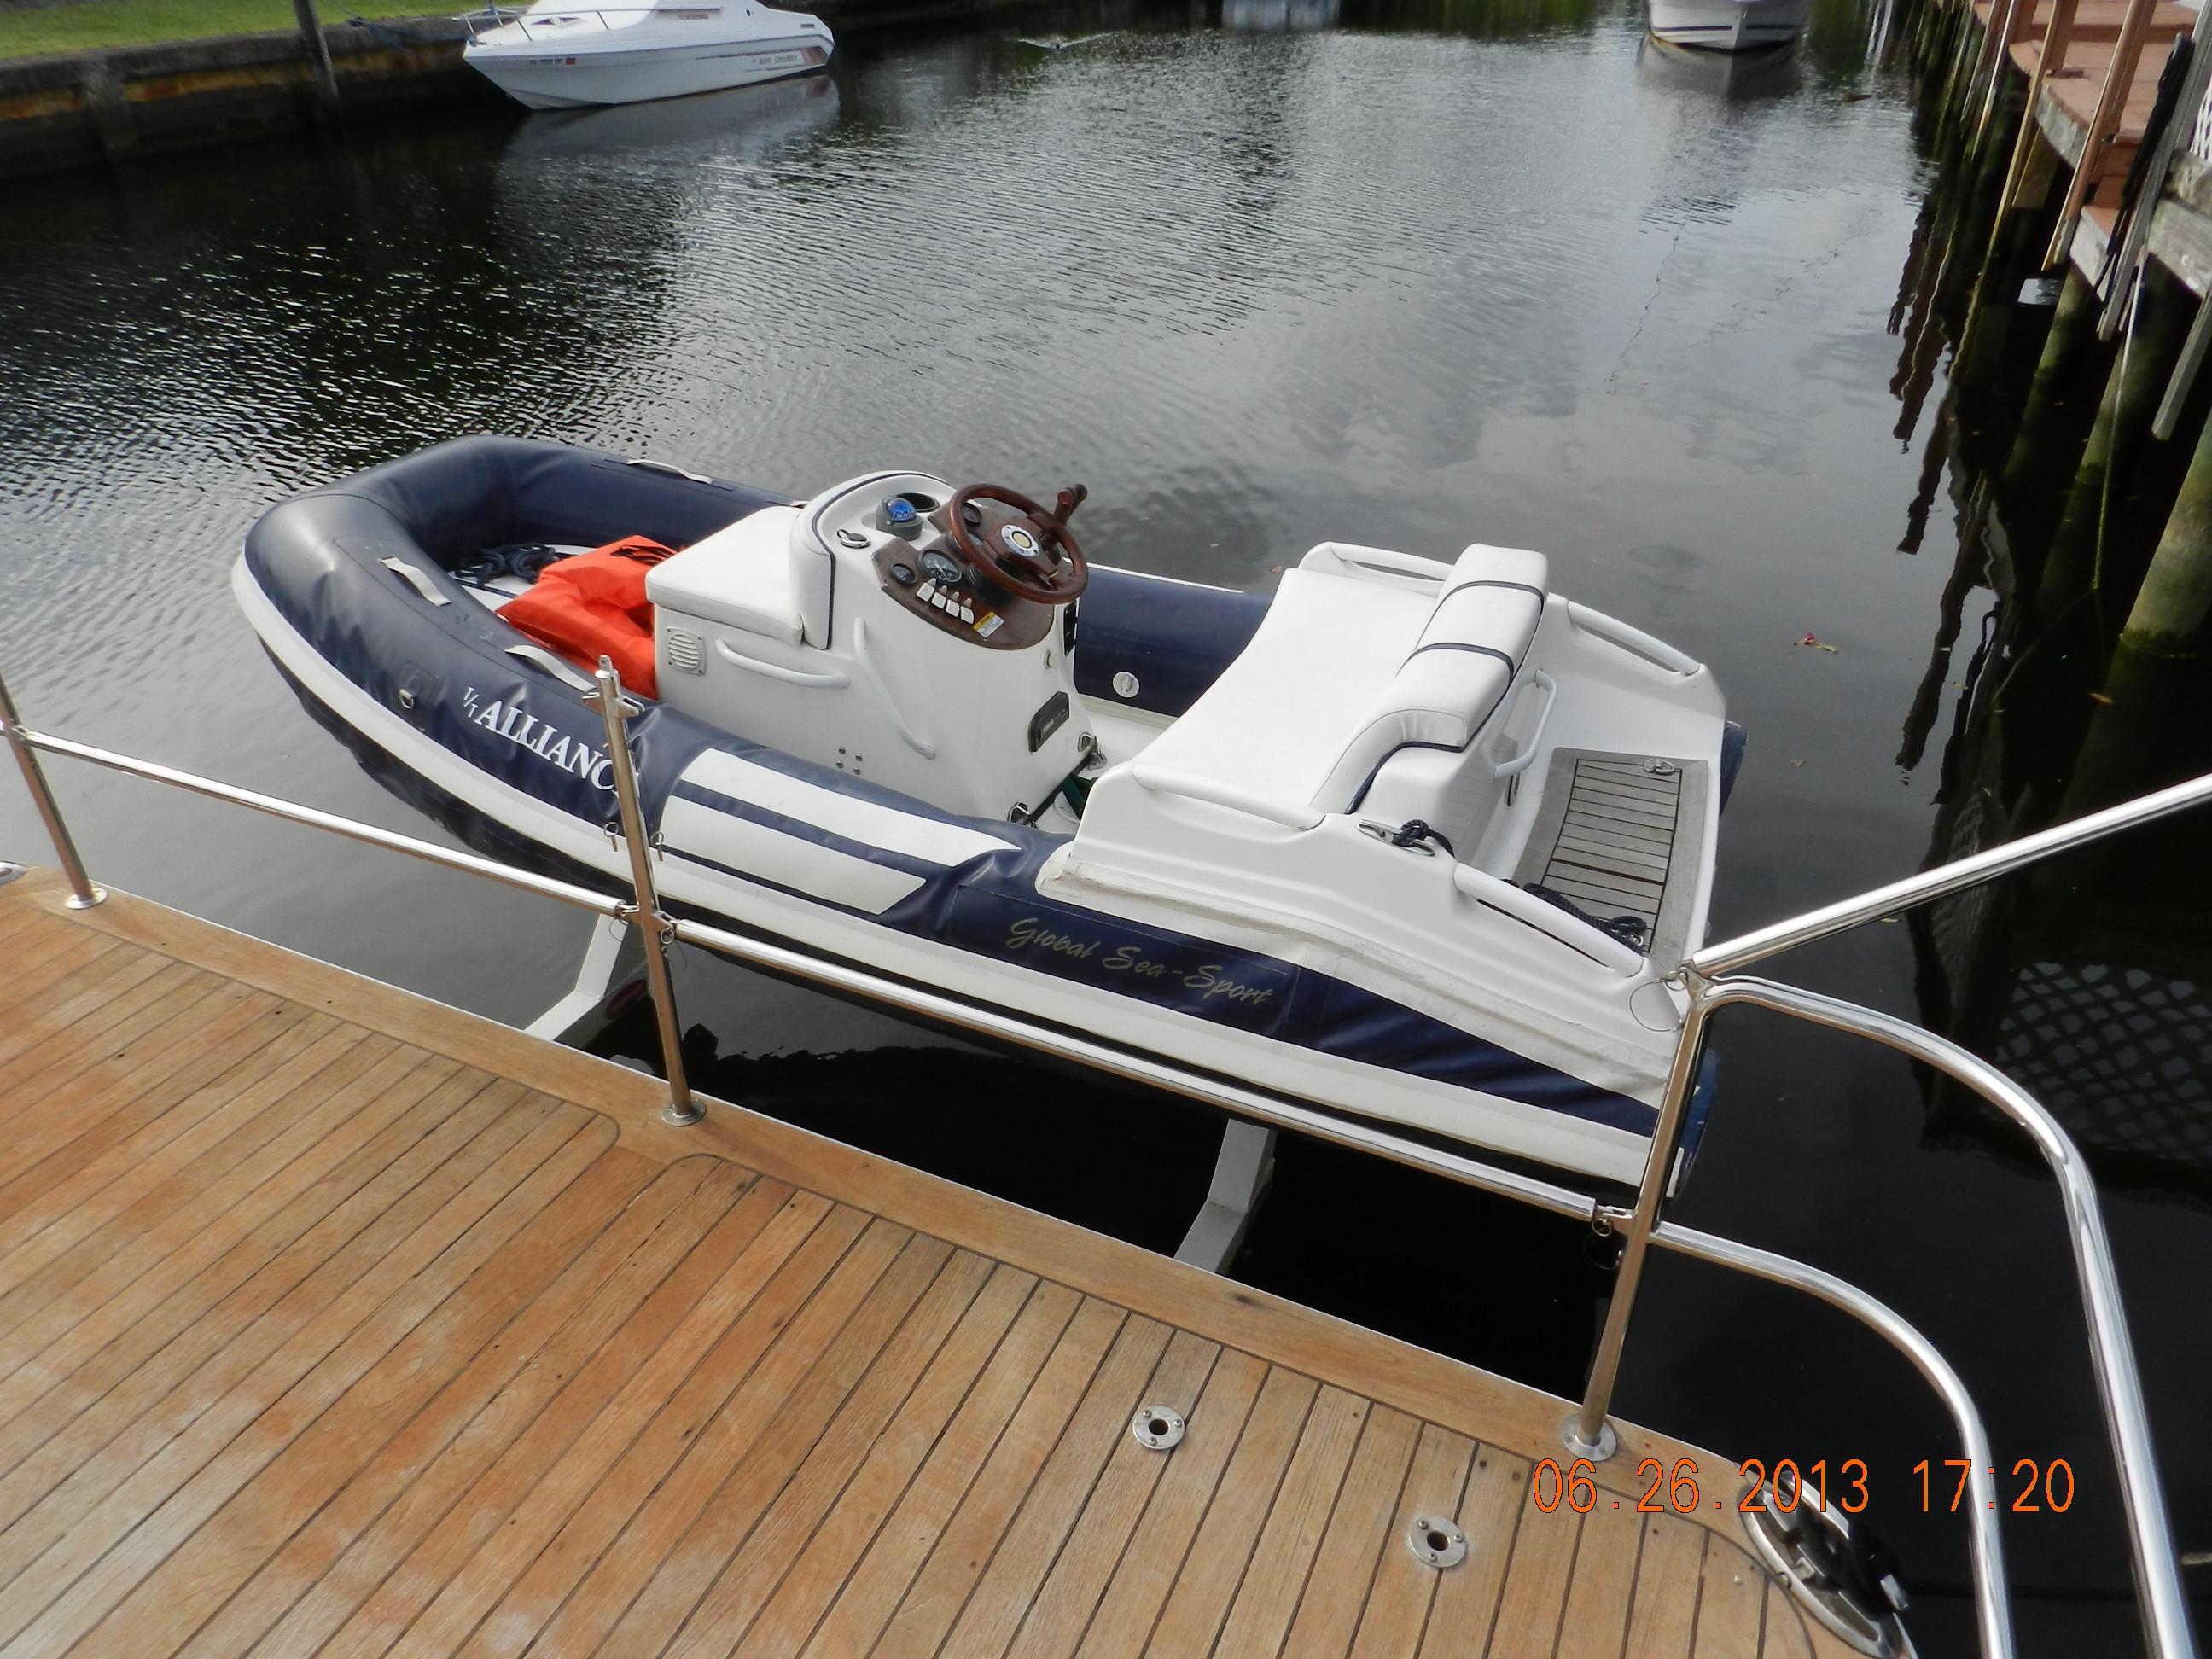 Alliance_yacht_June_2013 014